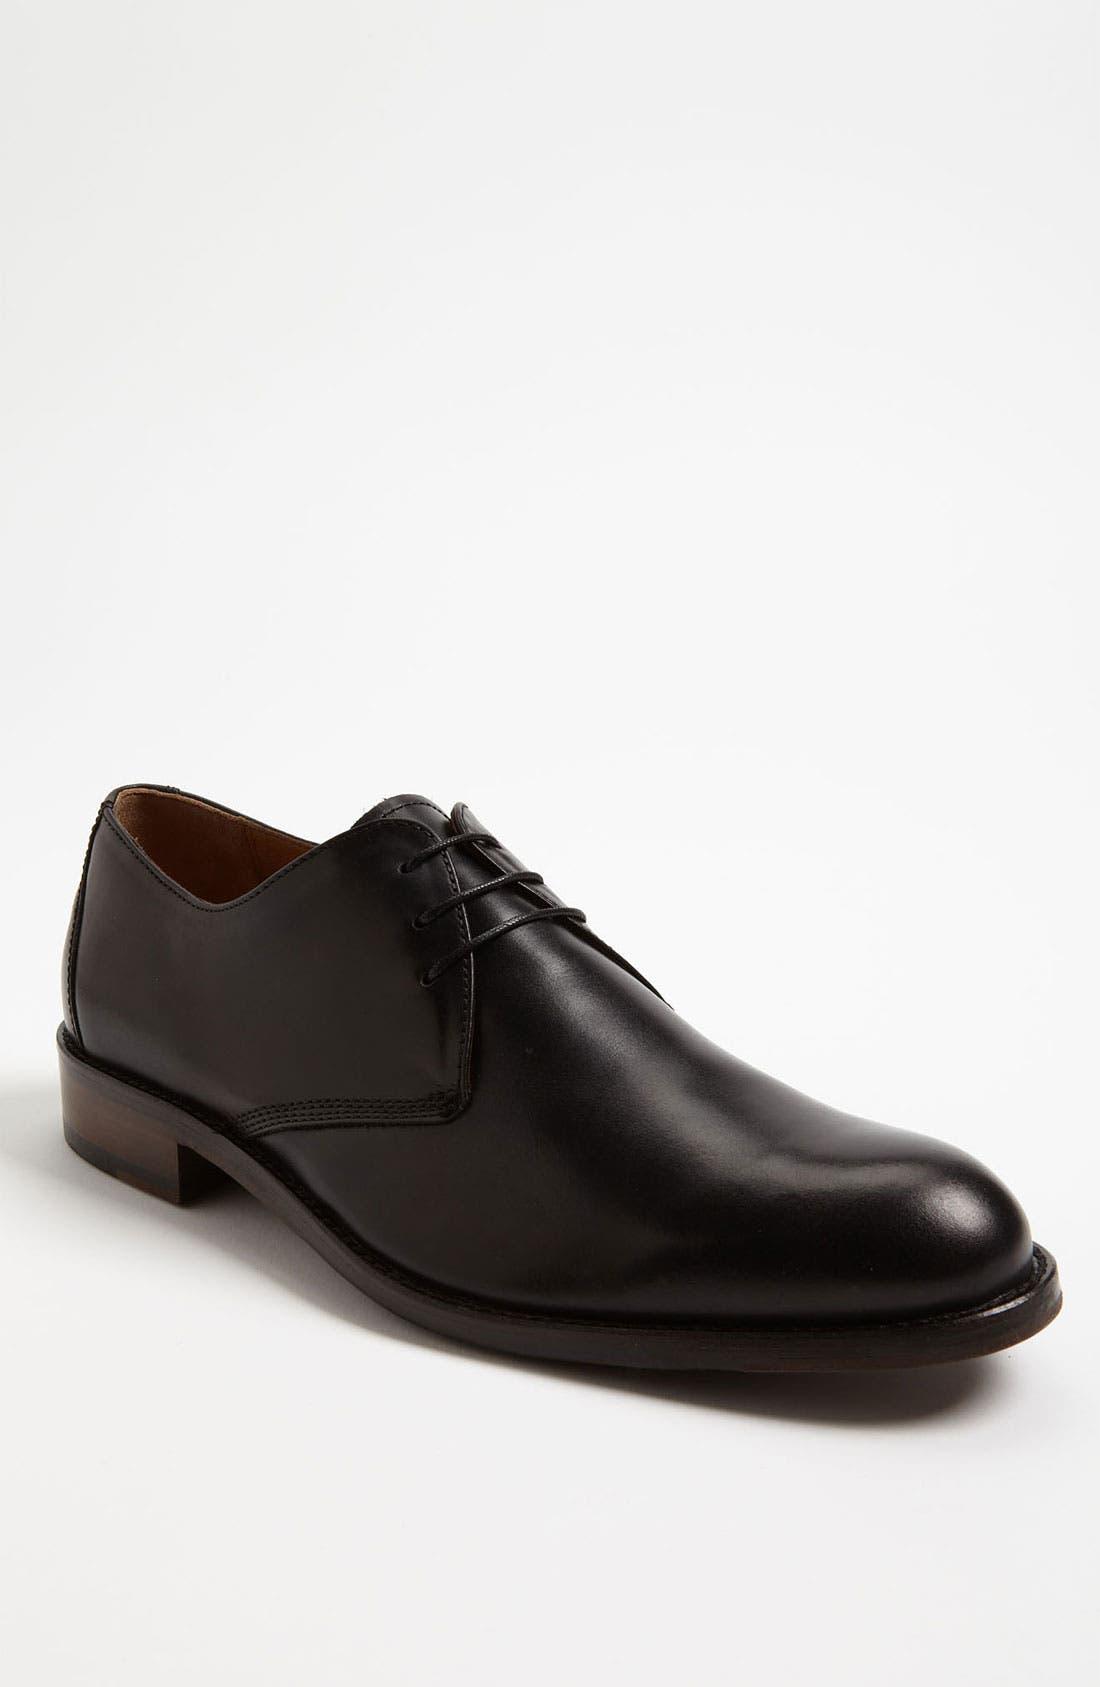 Alternate Image 1 Selected - Johnston & Murphy 'Hartley' Plain Toe Derby (Men)